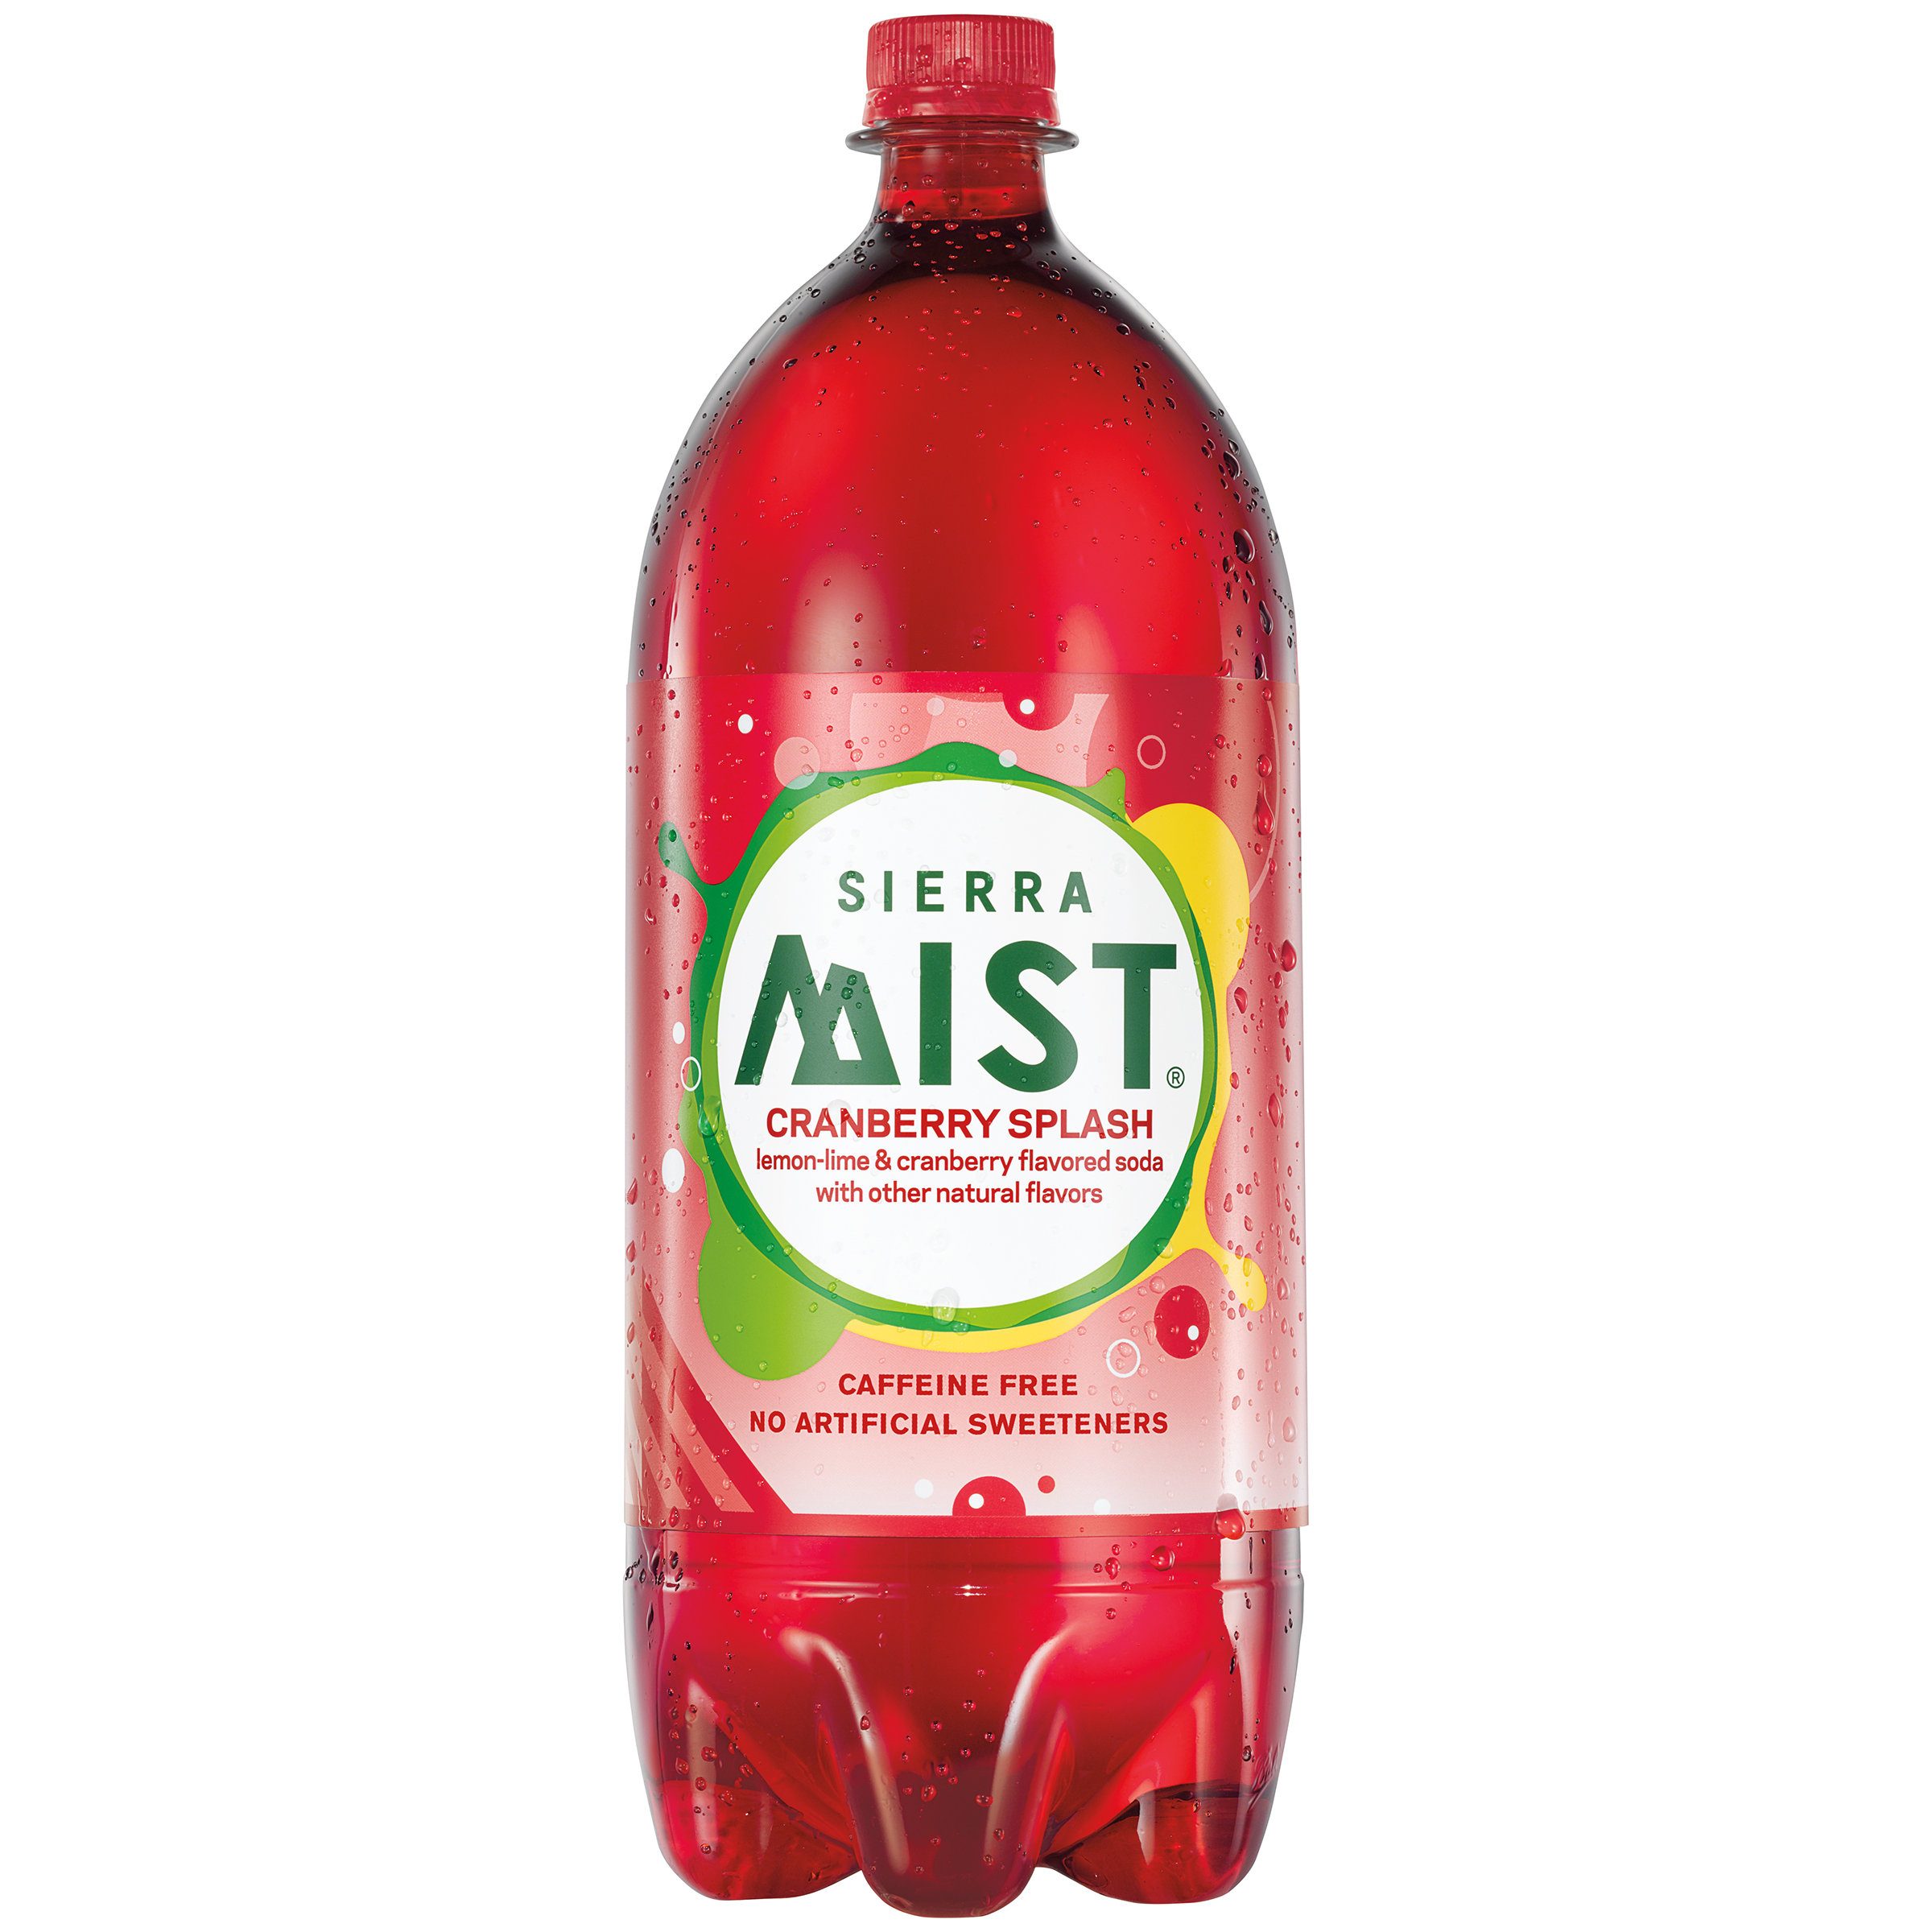 Sierra Mist Cranberry Splash Soda 67.6 Fl Oz Plastic